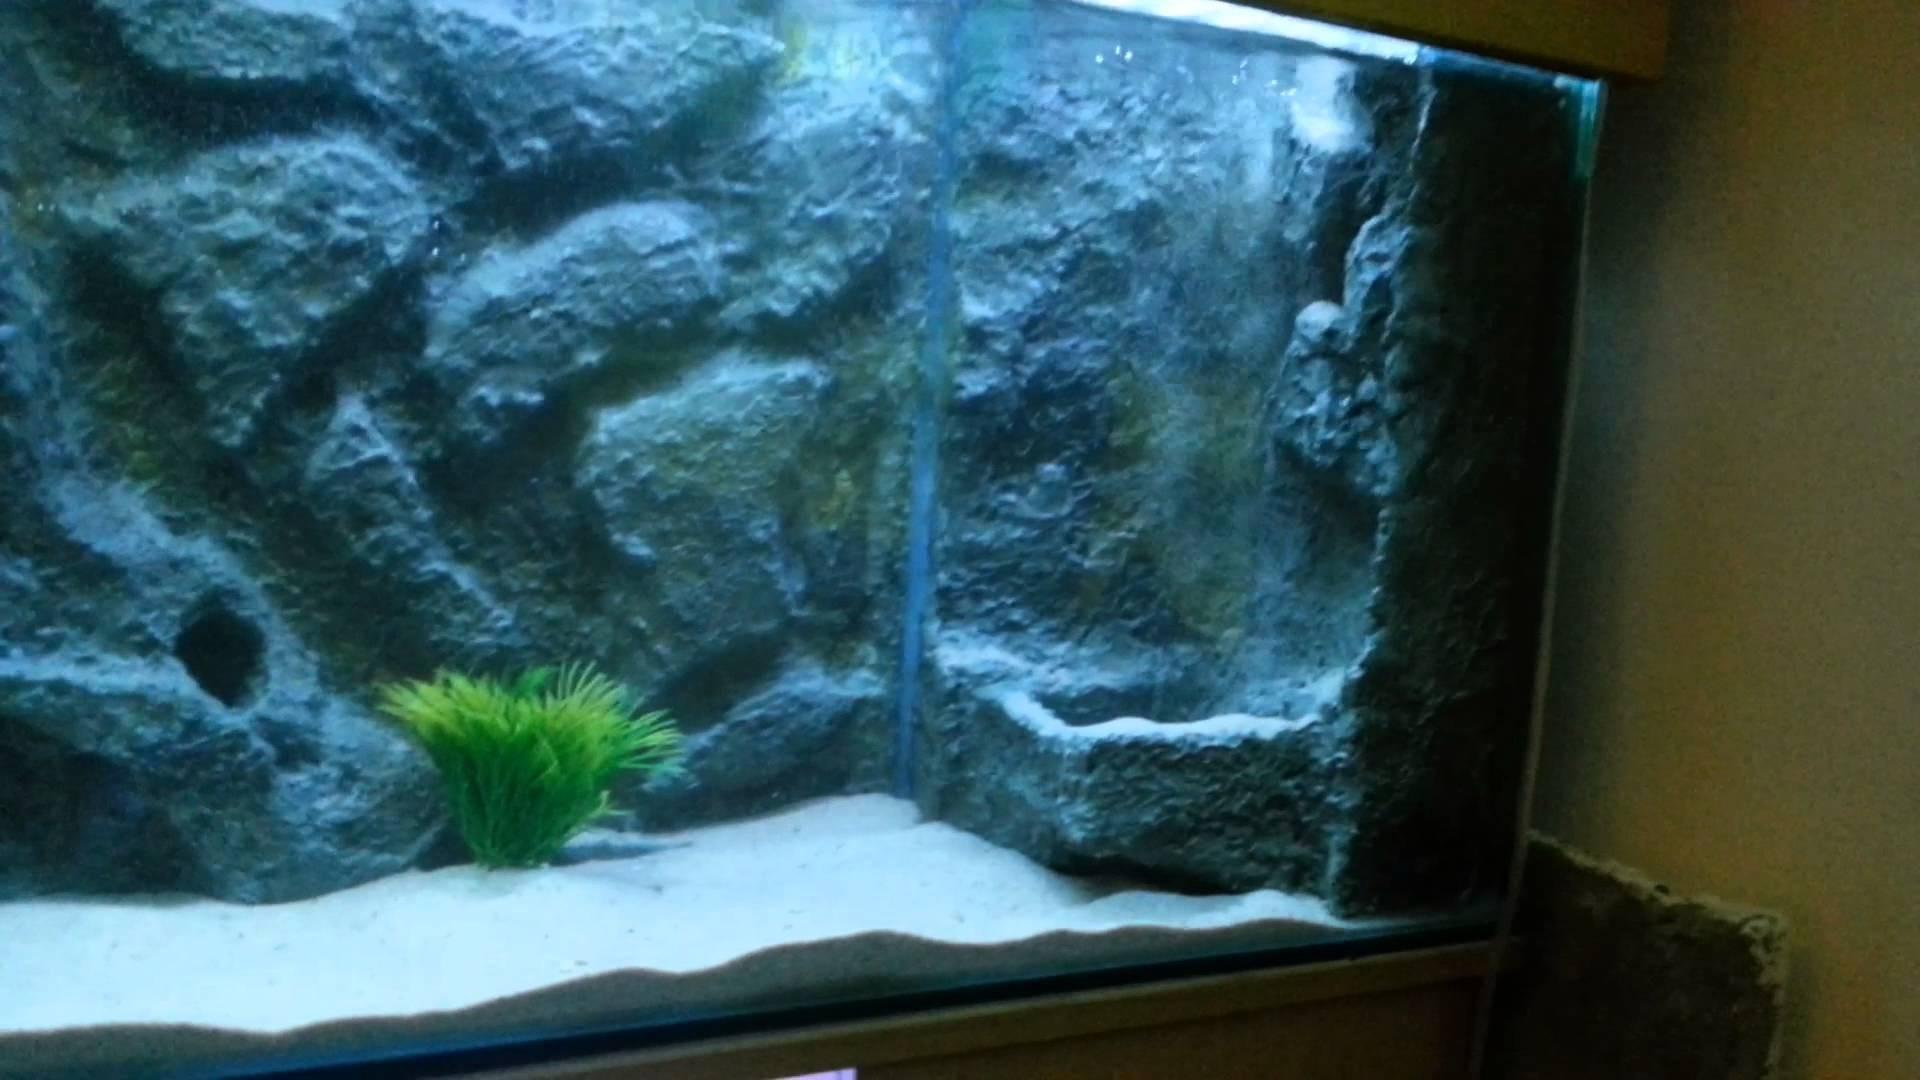 Fish Tank 3d Wallpaper Download Aquarium Background 183 ① Download Free Wallpapers For